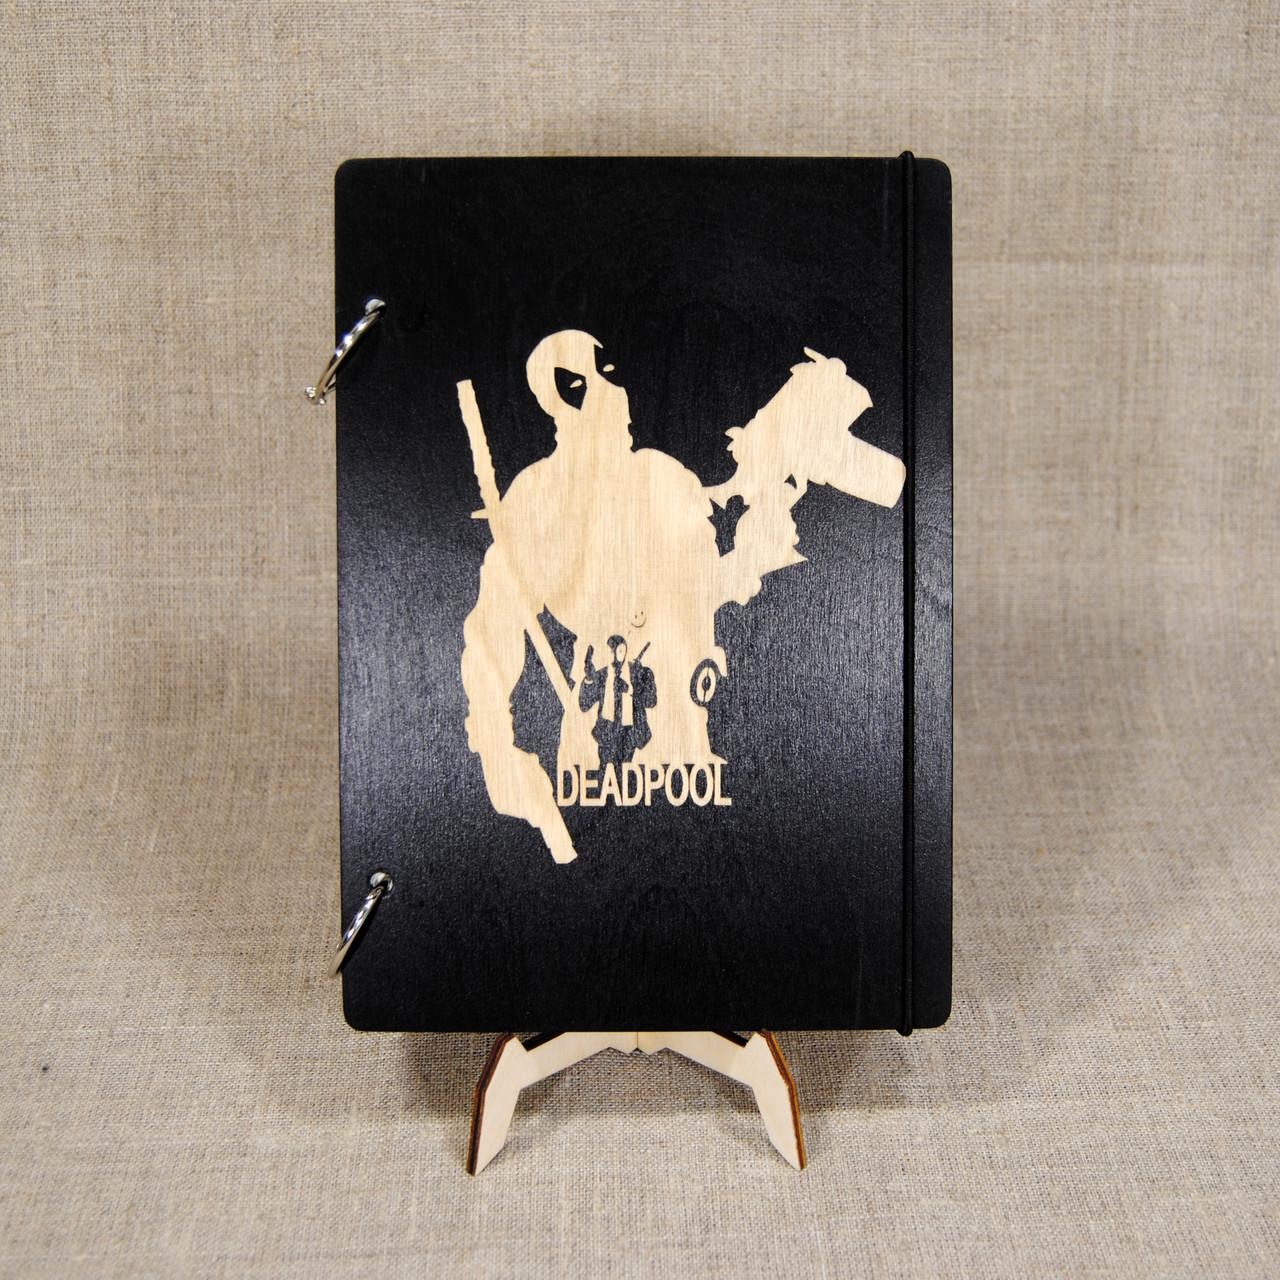 Блокнот (скетчбук) А5 (14,5 х 20,6 см) Дэдпул МАРВЕЛ Deadpool. Деревянная обложка, сменная бумага.